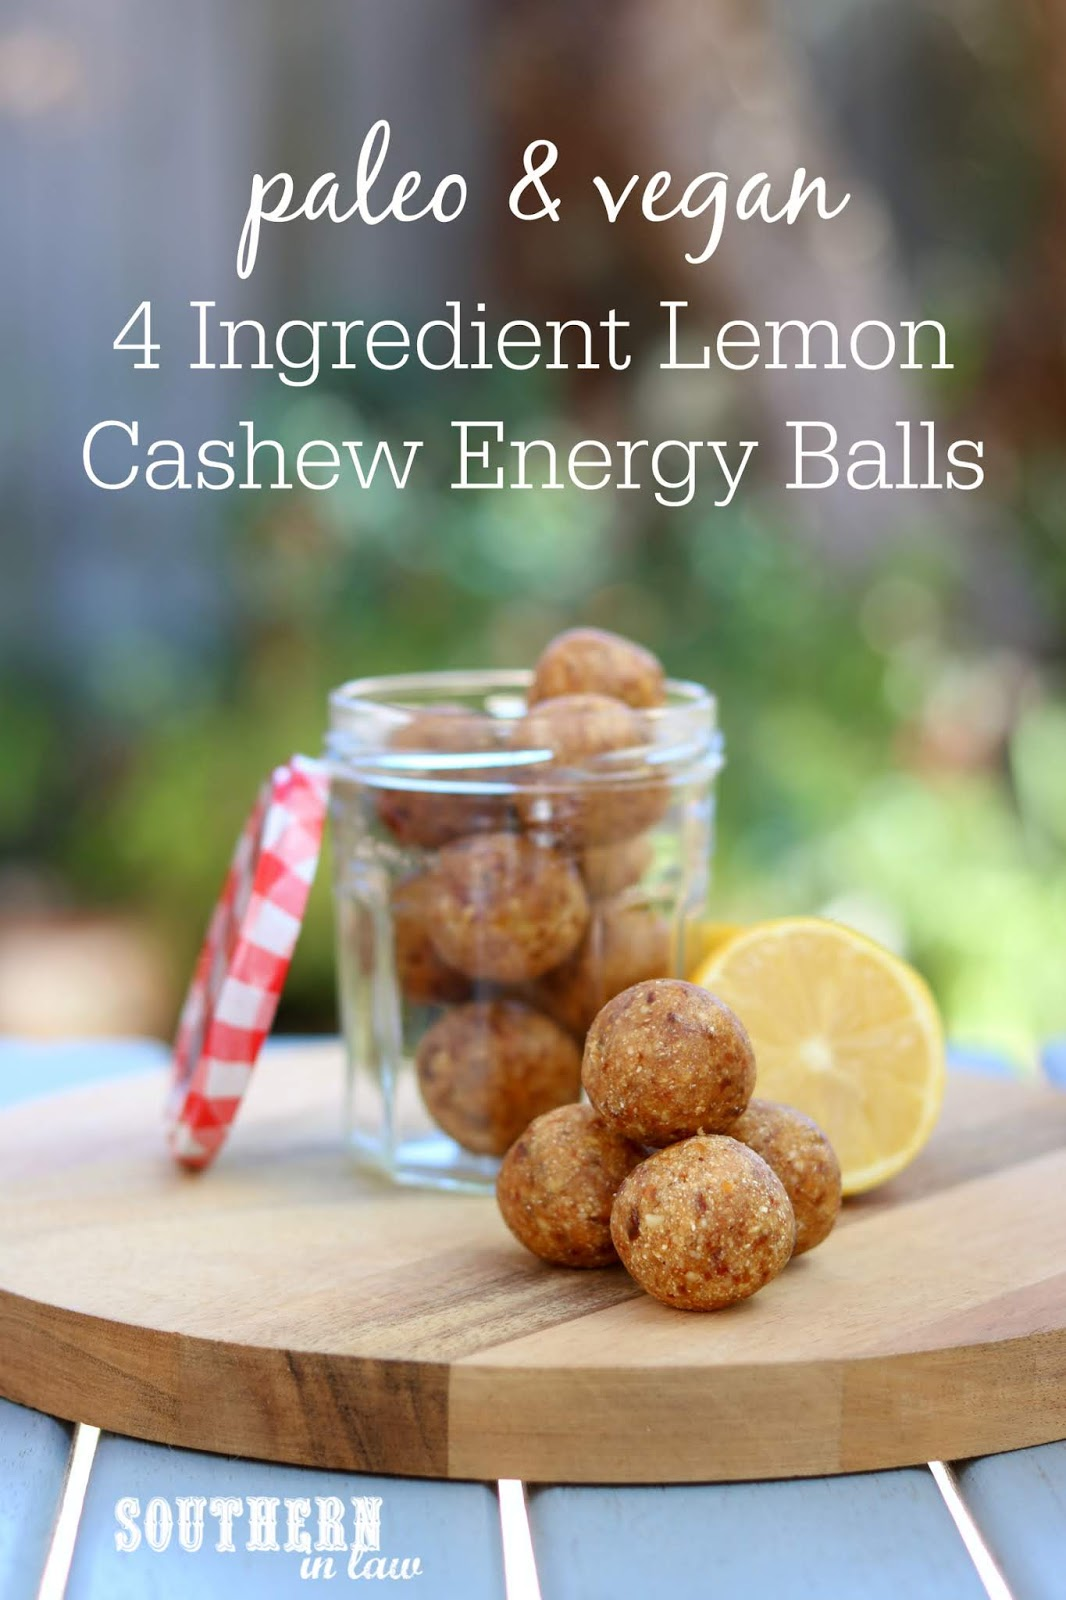 Southern in law recipe 4 ingredient lemon cashew energy balls raw vegan lemon cashew energy balls recipe paleo bliss balls energy bites protein forumfinder Choice Image